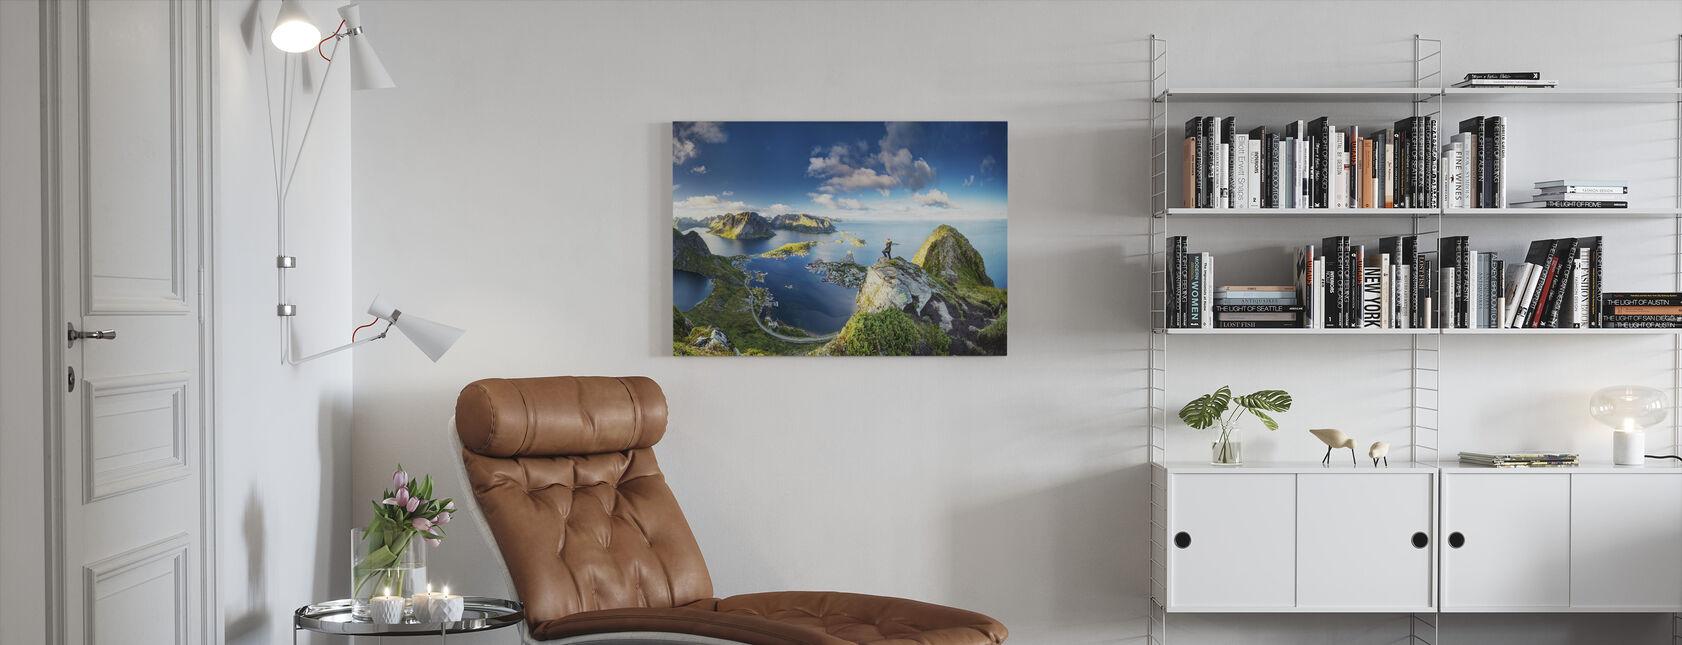 Bringing Views - Canvas print - Living Room